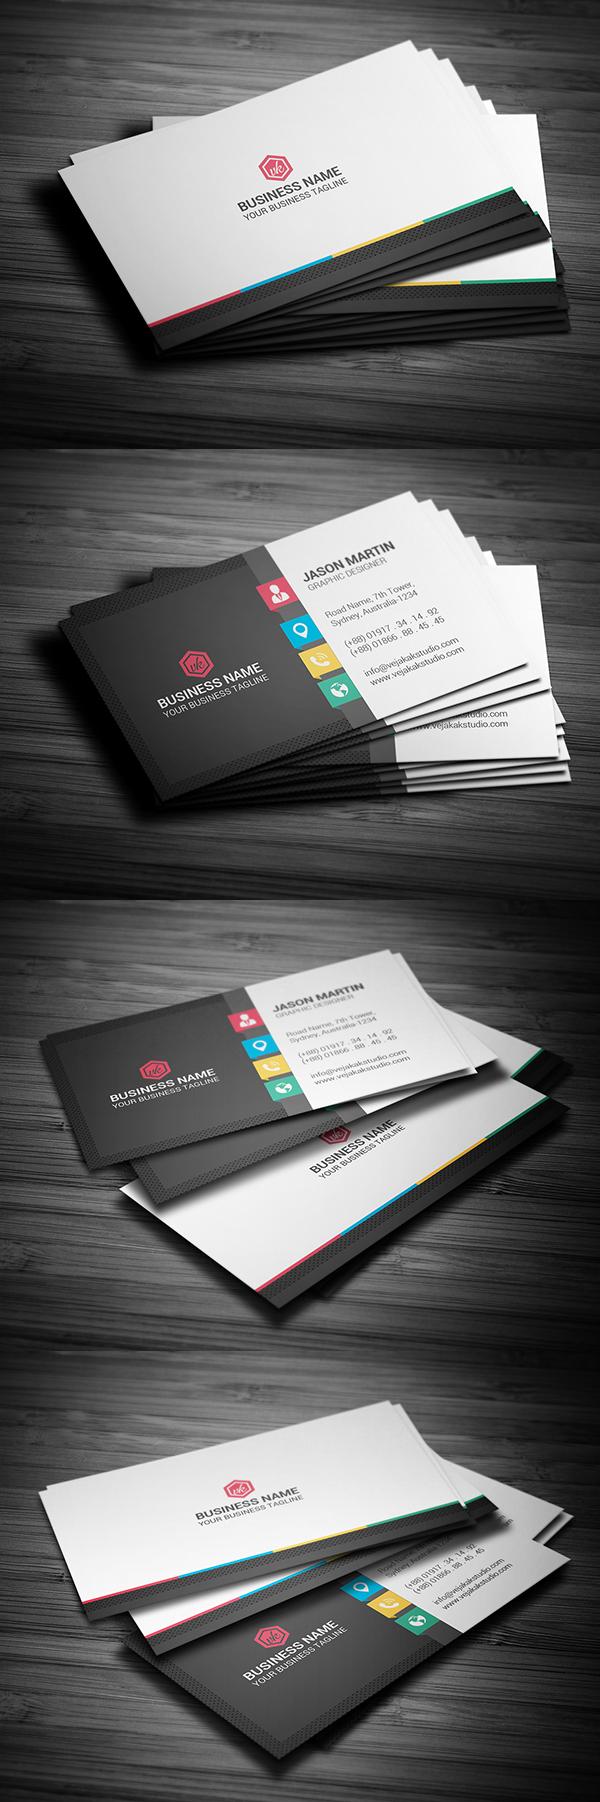 24 Business Card Design